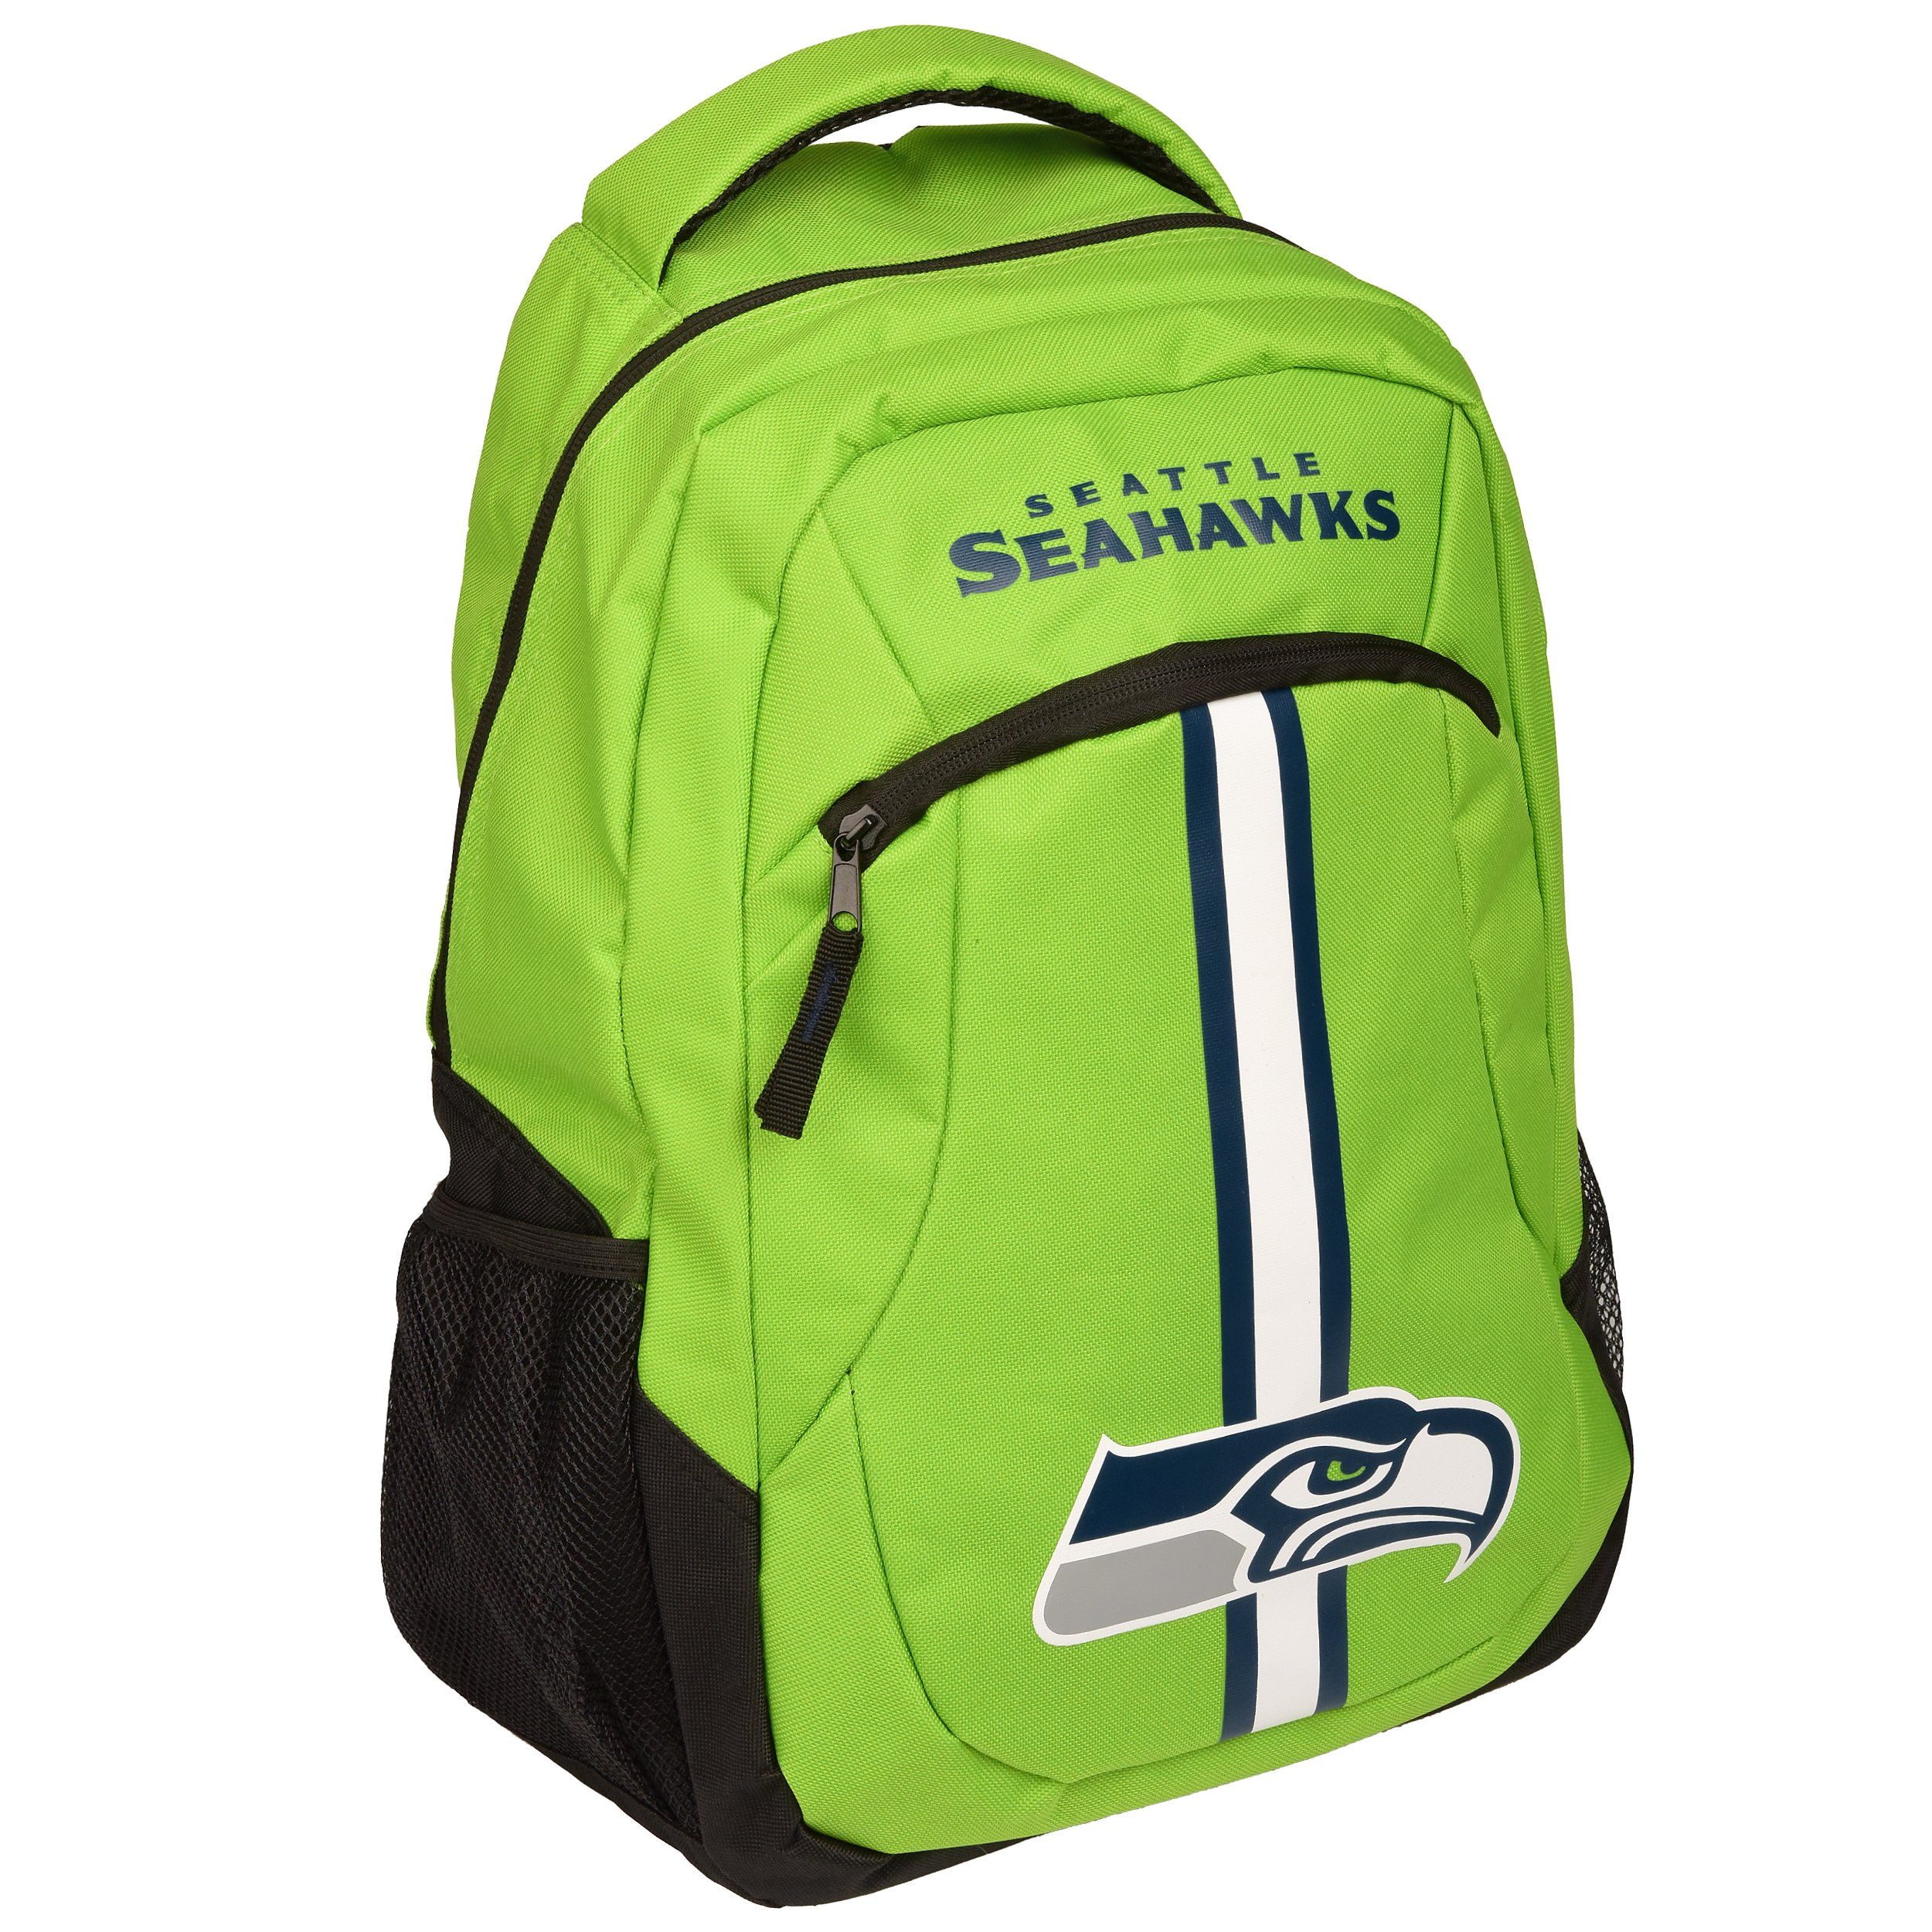 TBFC 2017 NFL Action Backpack School Gym Bag - Seattle Seahawks